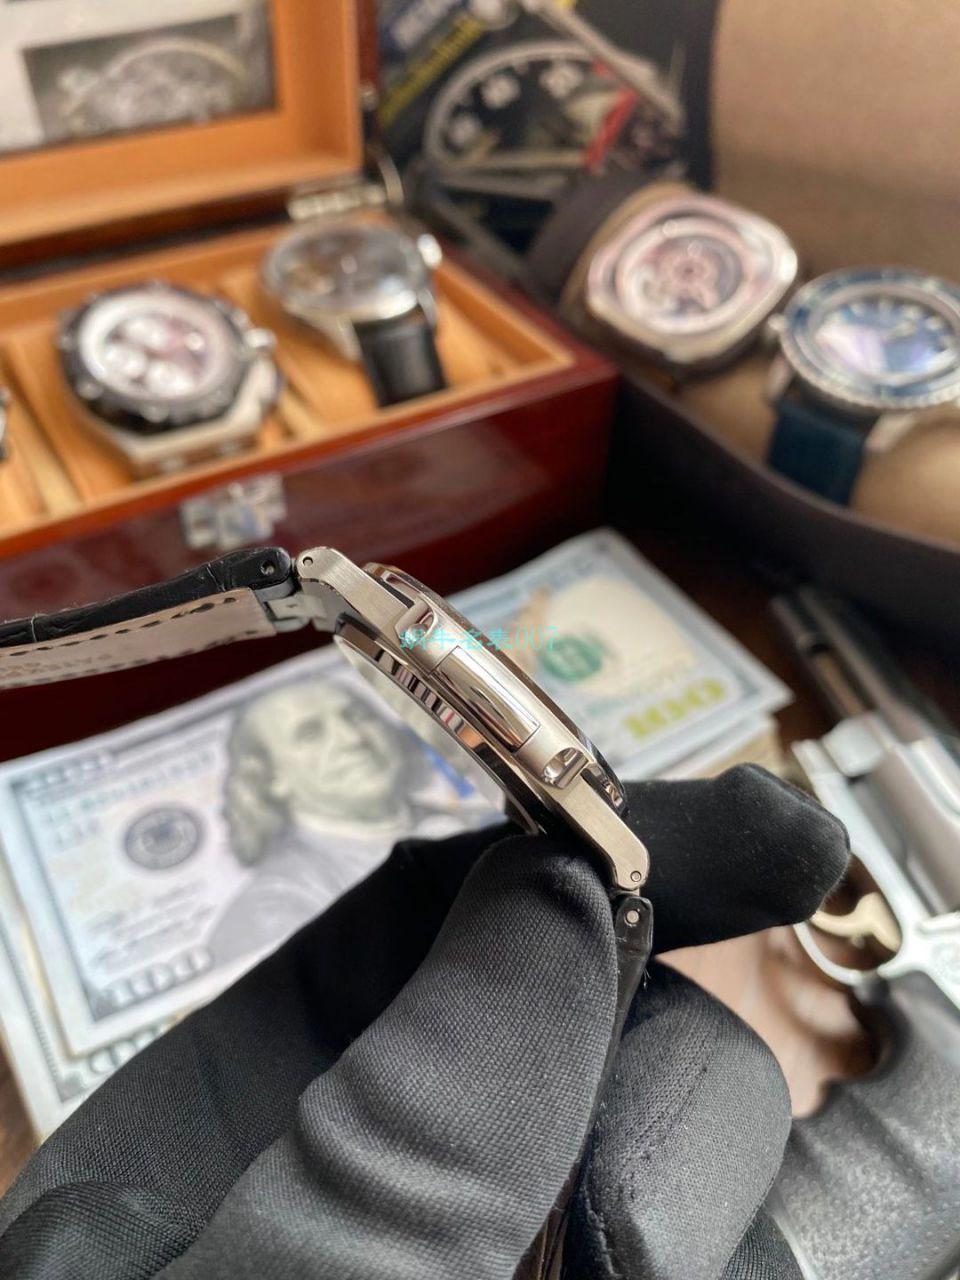 GR厂V2版本1比1超A高仿手表百达翡丽鹦鹉螺5711R 玫瑰金腕表 / BD338